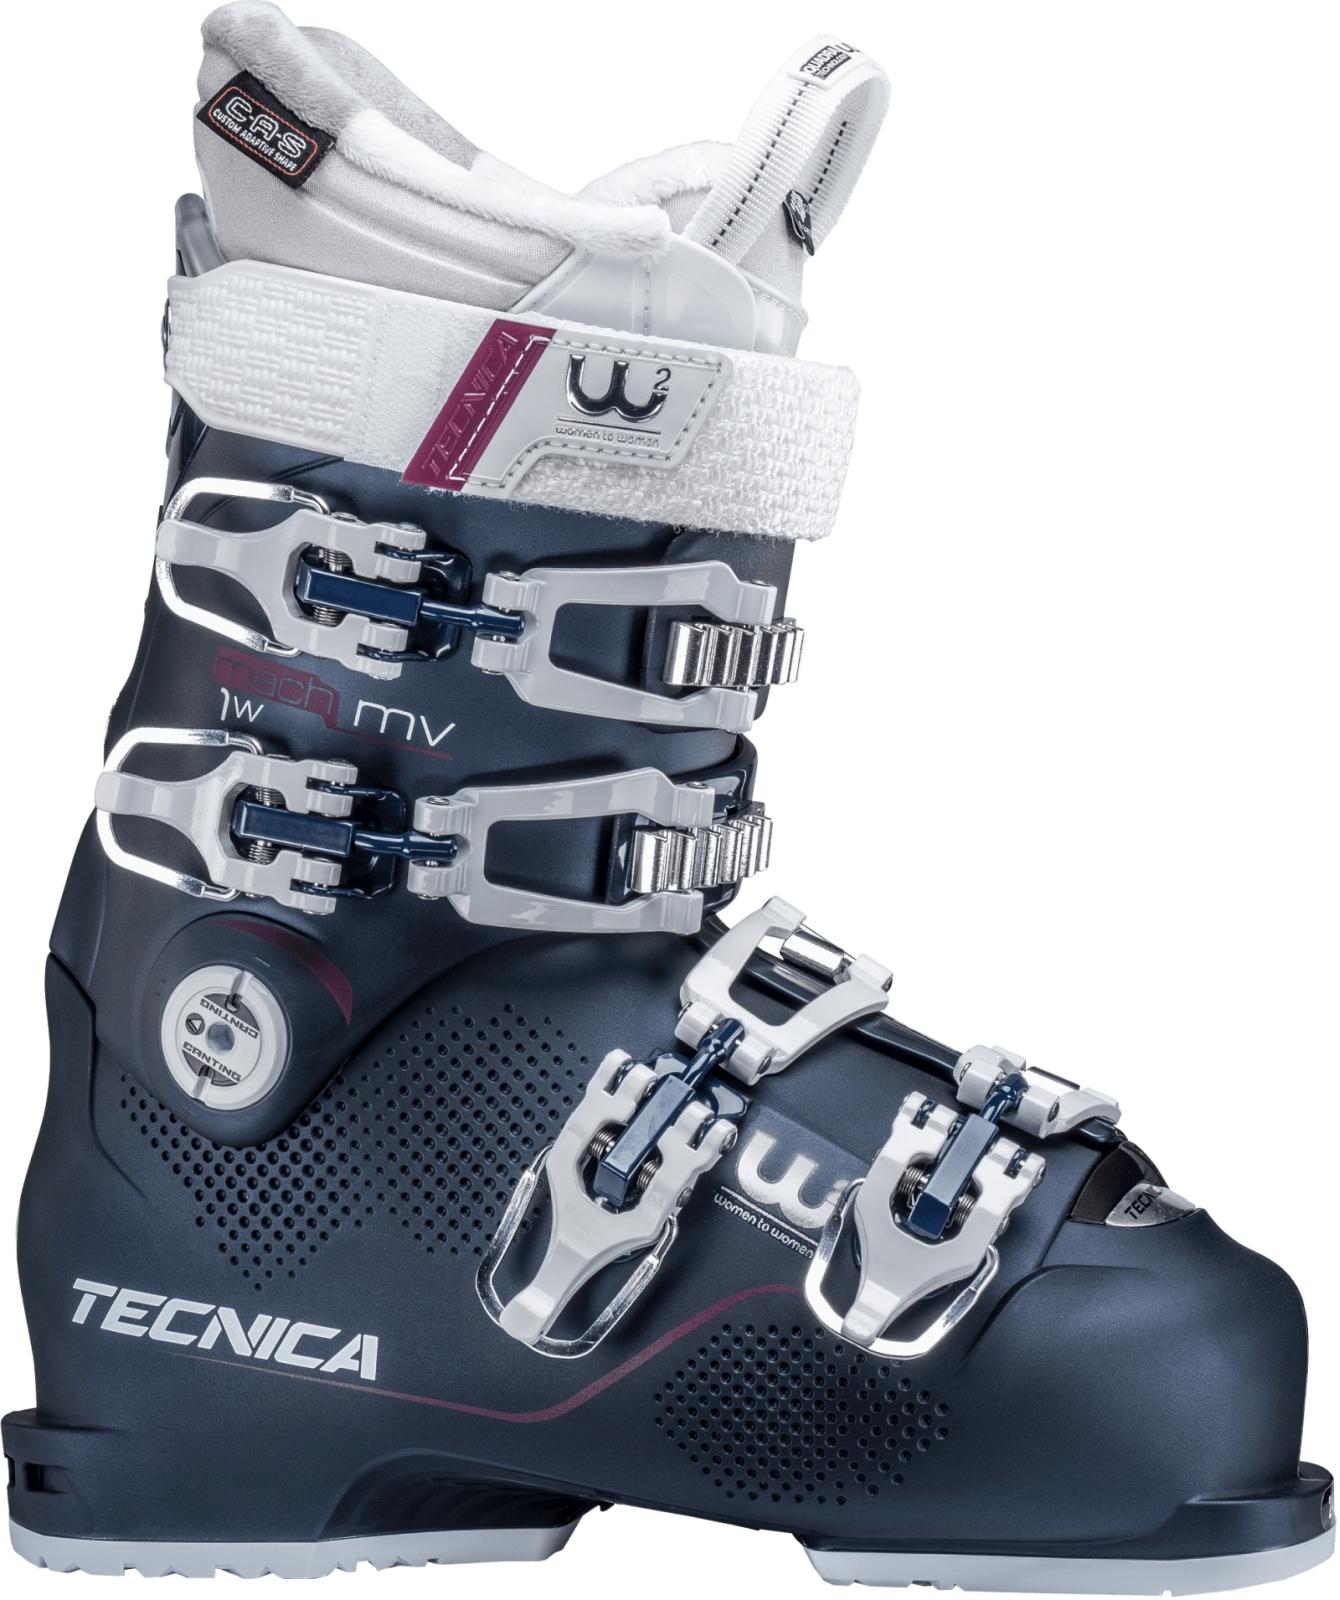 fd360ef2ff4 Dámské lyžařské boty Tecnica Mach1 95 W MV - night blue - Ski a Bike ...